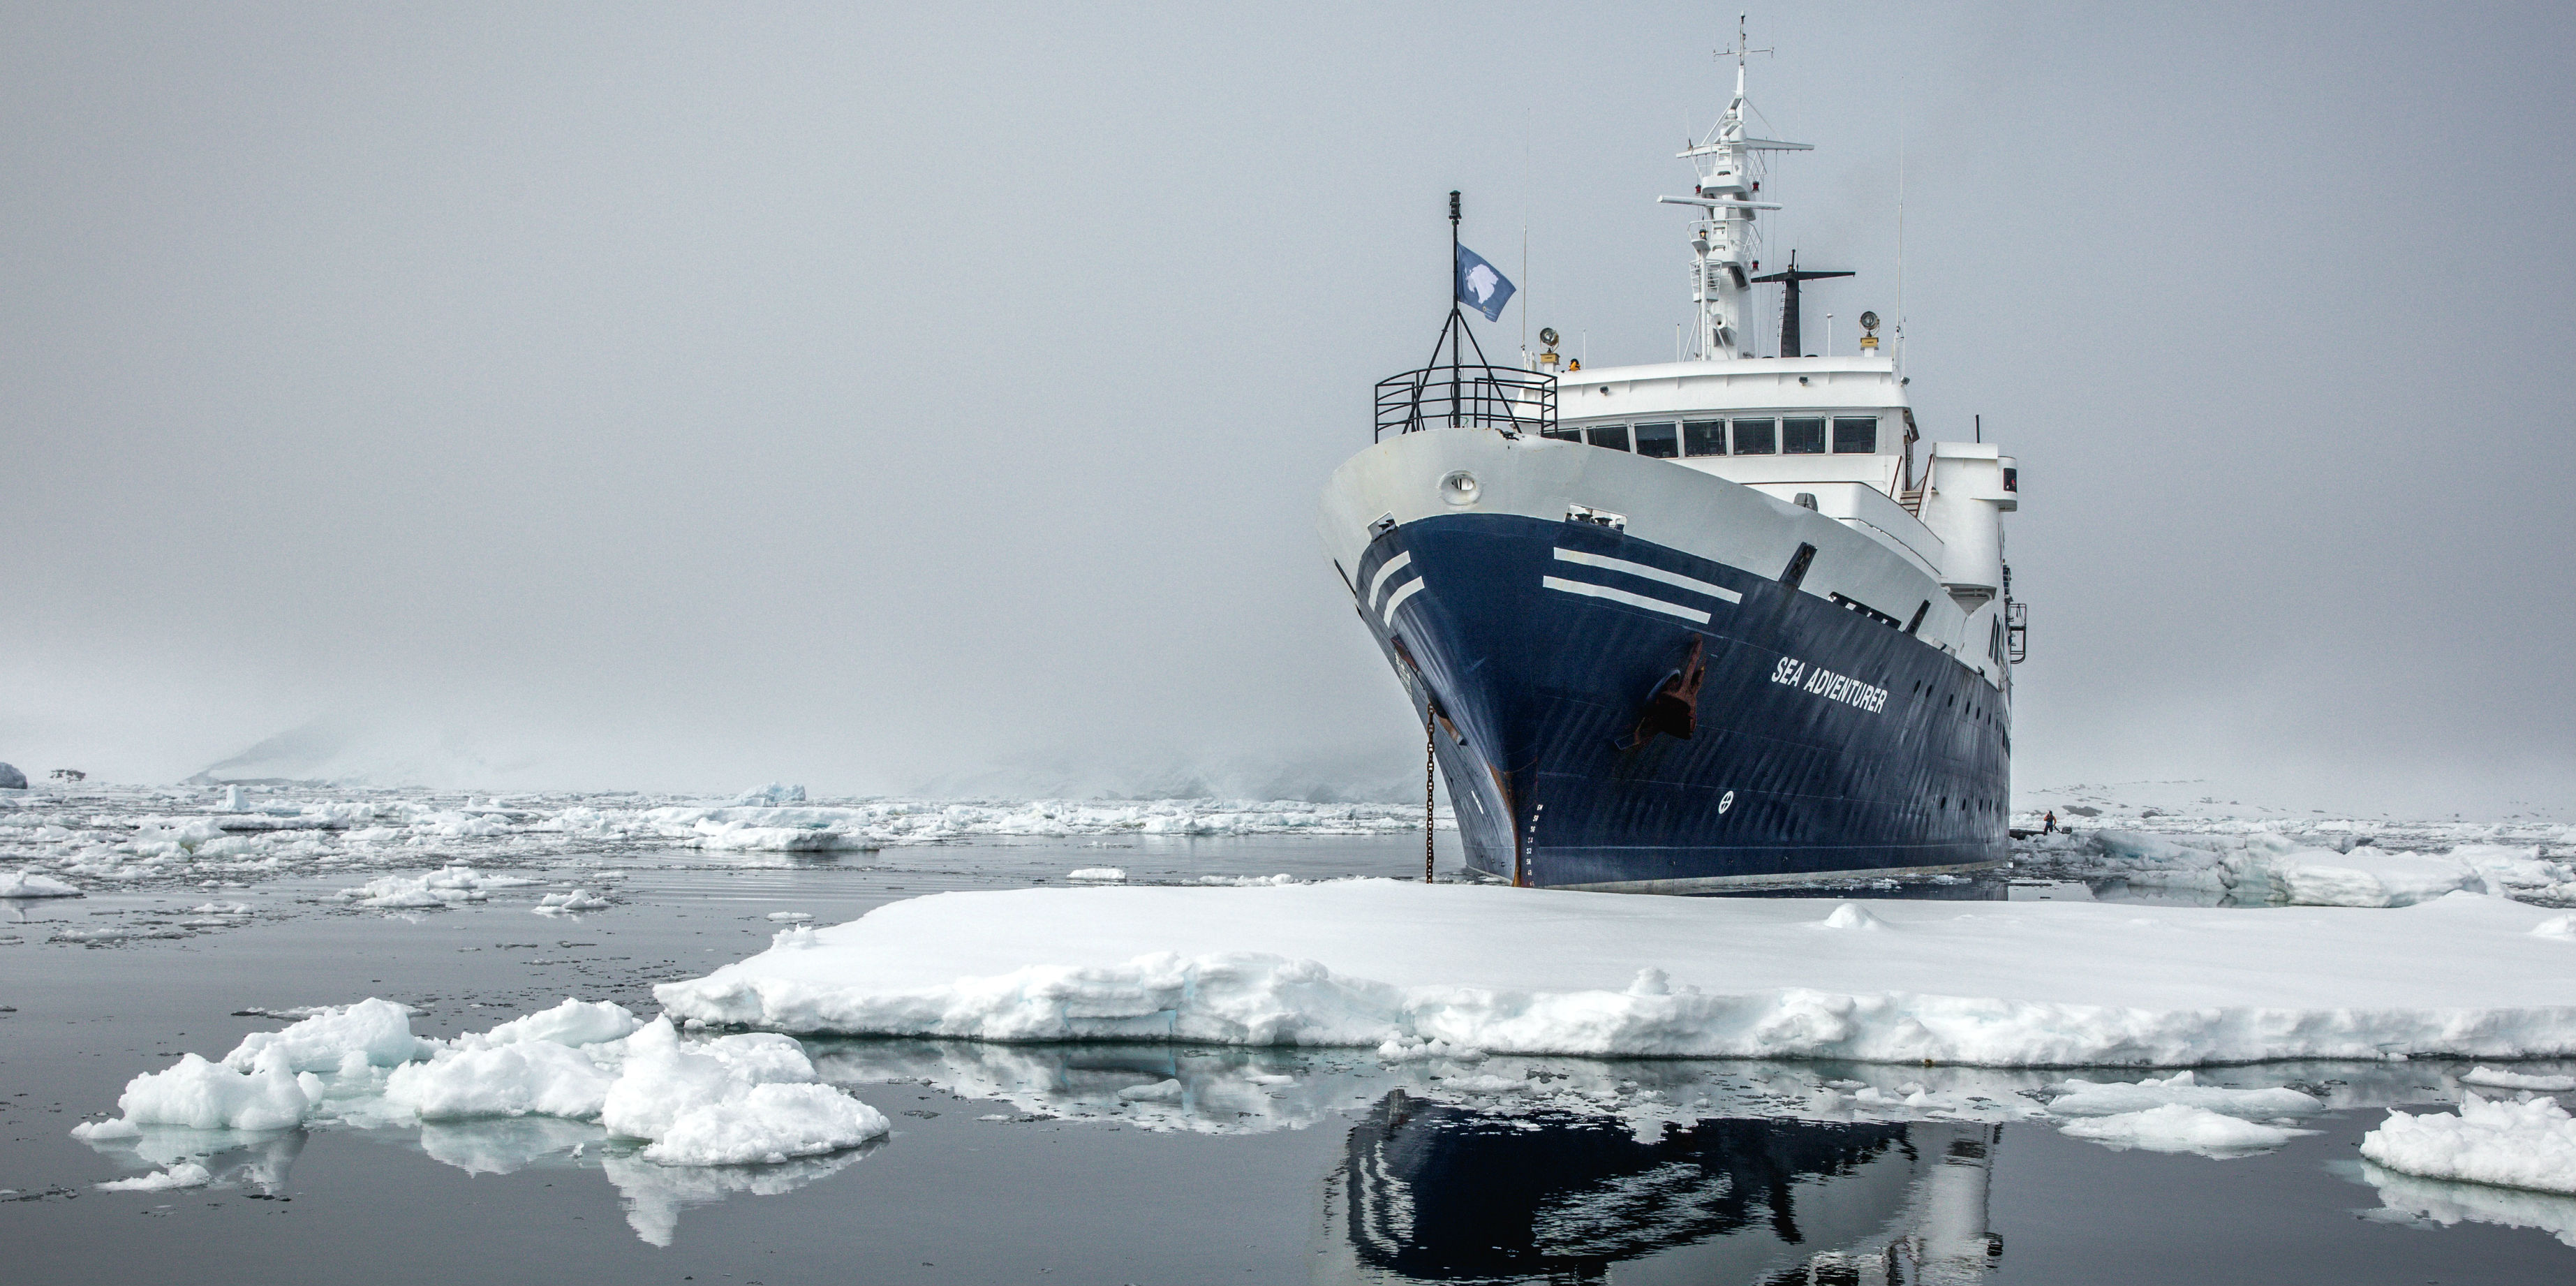 The Sea Adventurer in ice-choked Antarctic waters.